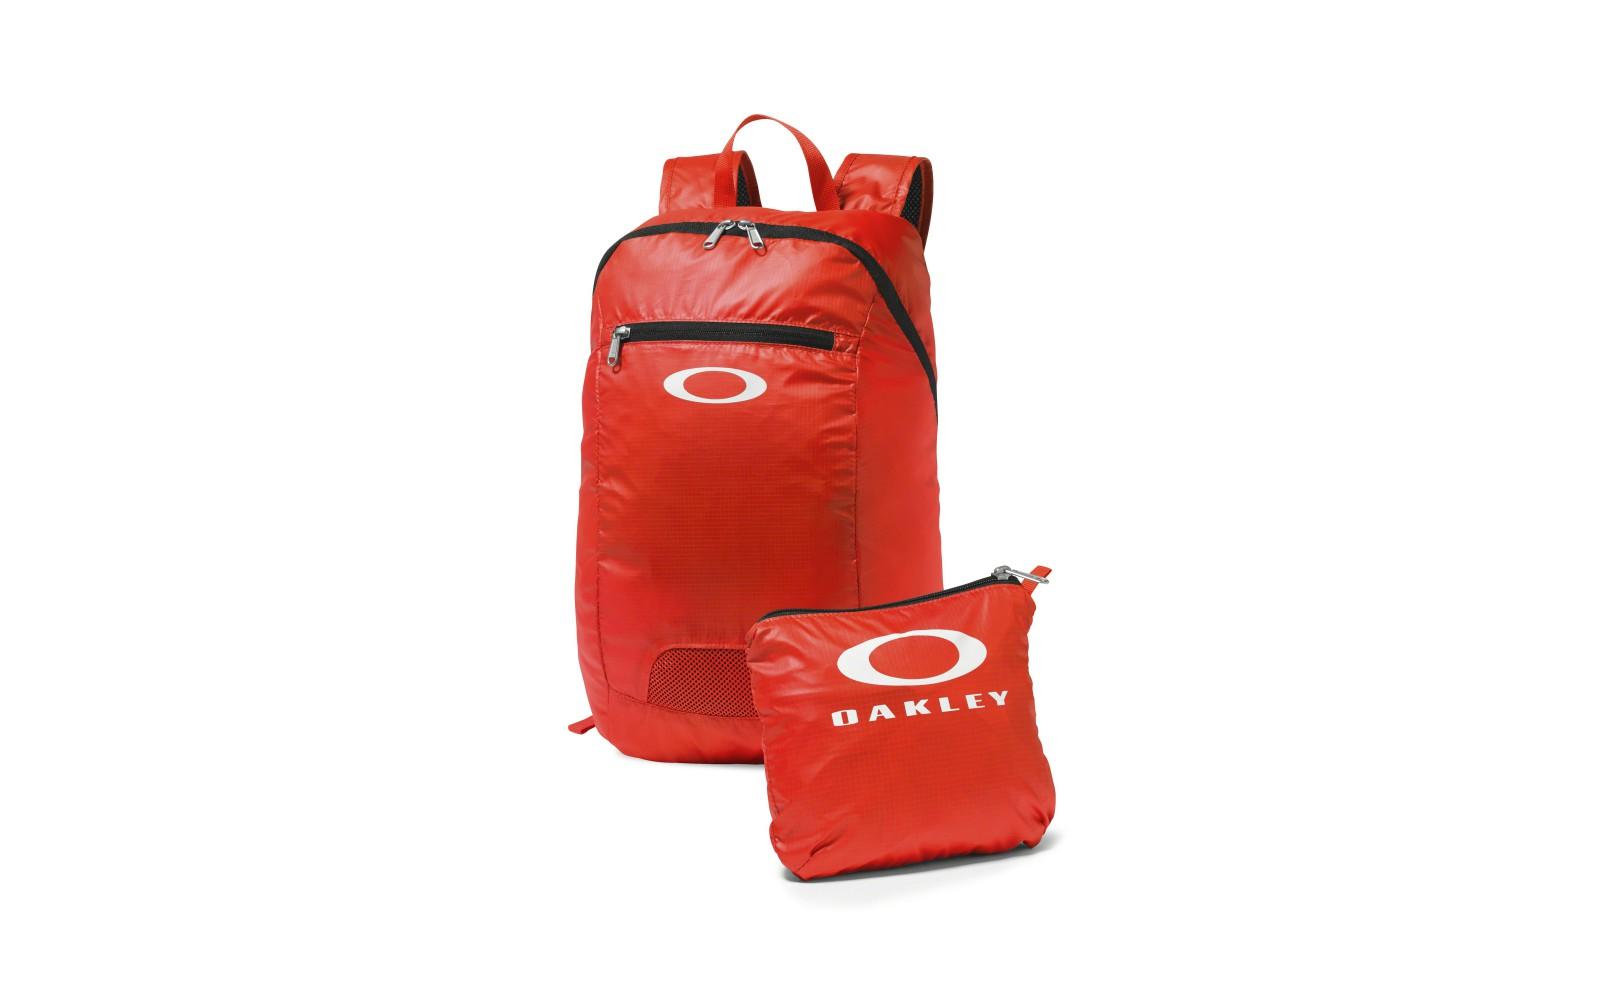 Oakley Packable Backpack - Coral Glow - 92732-823 Rugzak